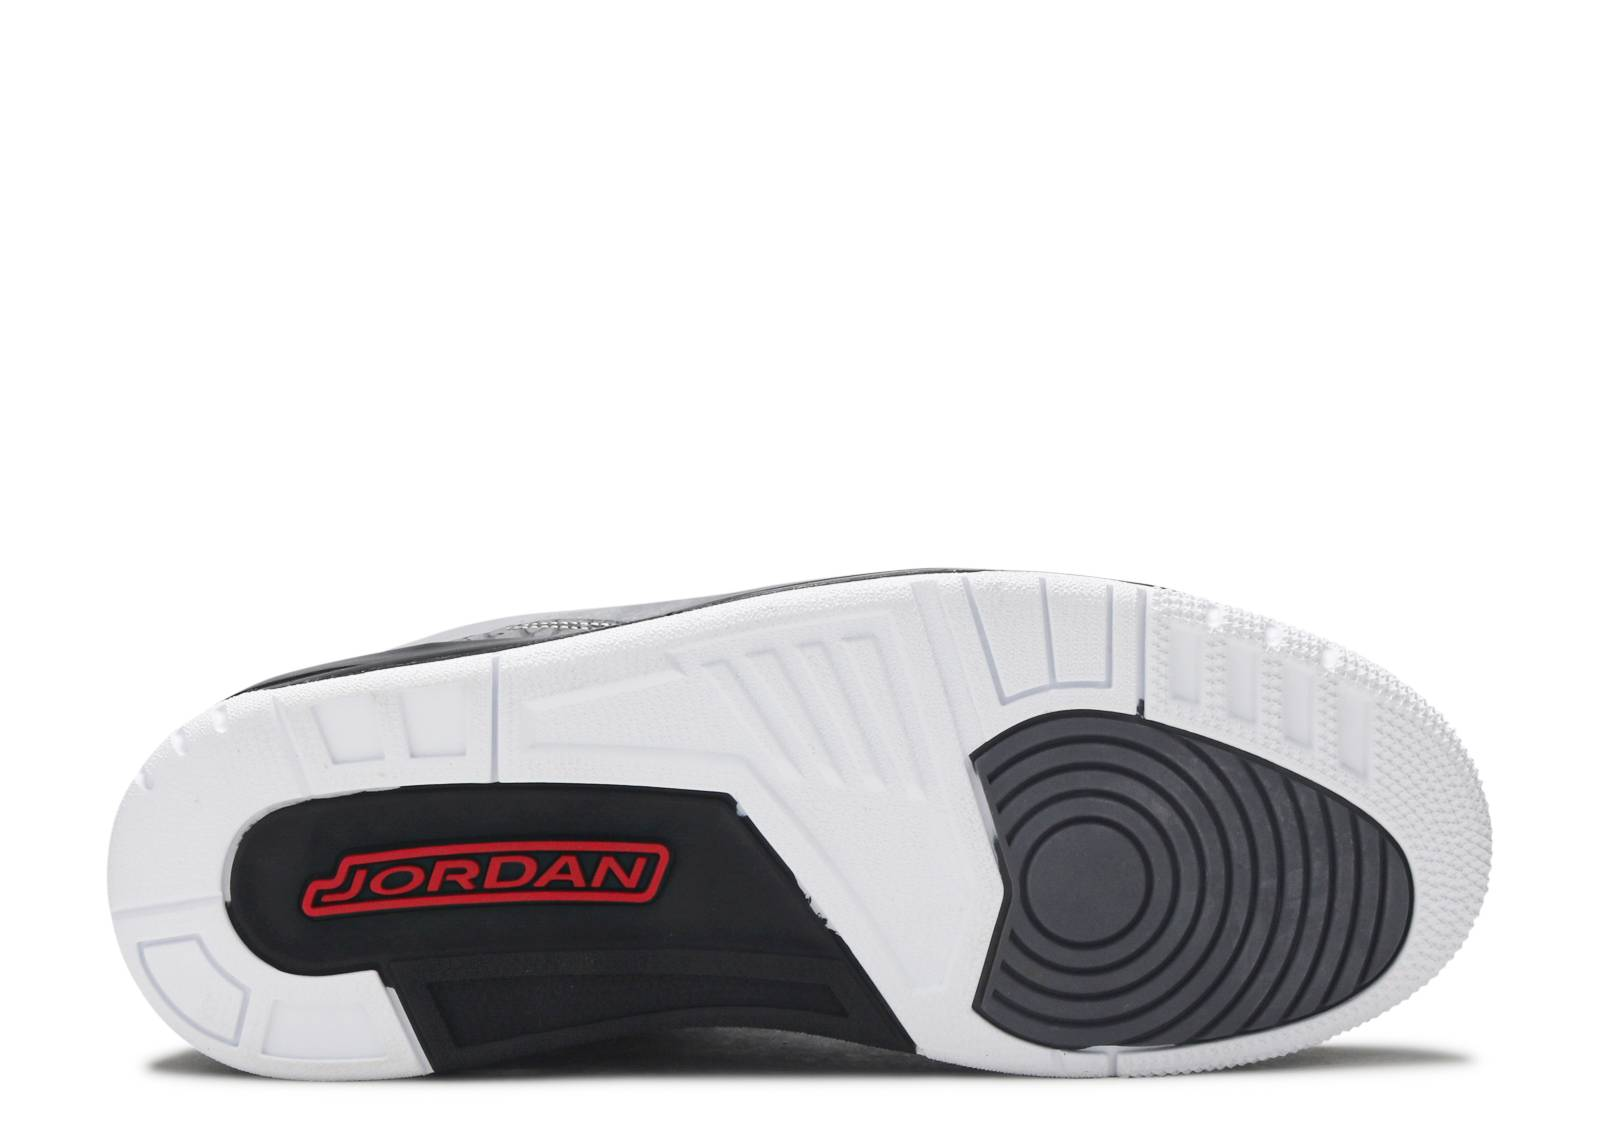 finest selection cd1c1 6f567 Air Jordan 3 Retro